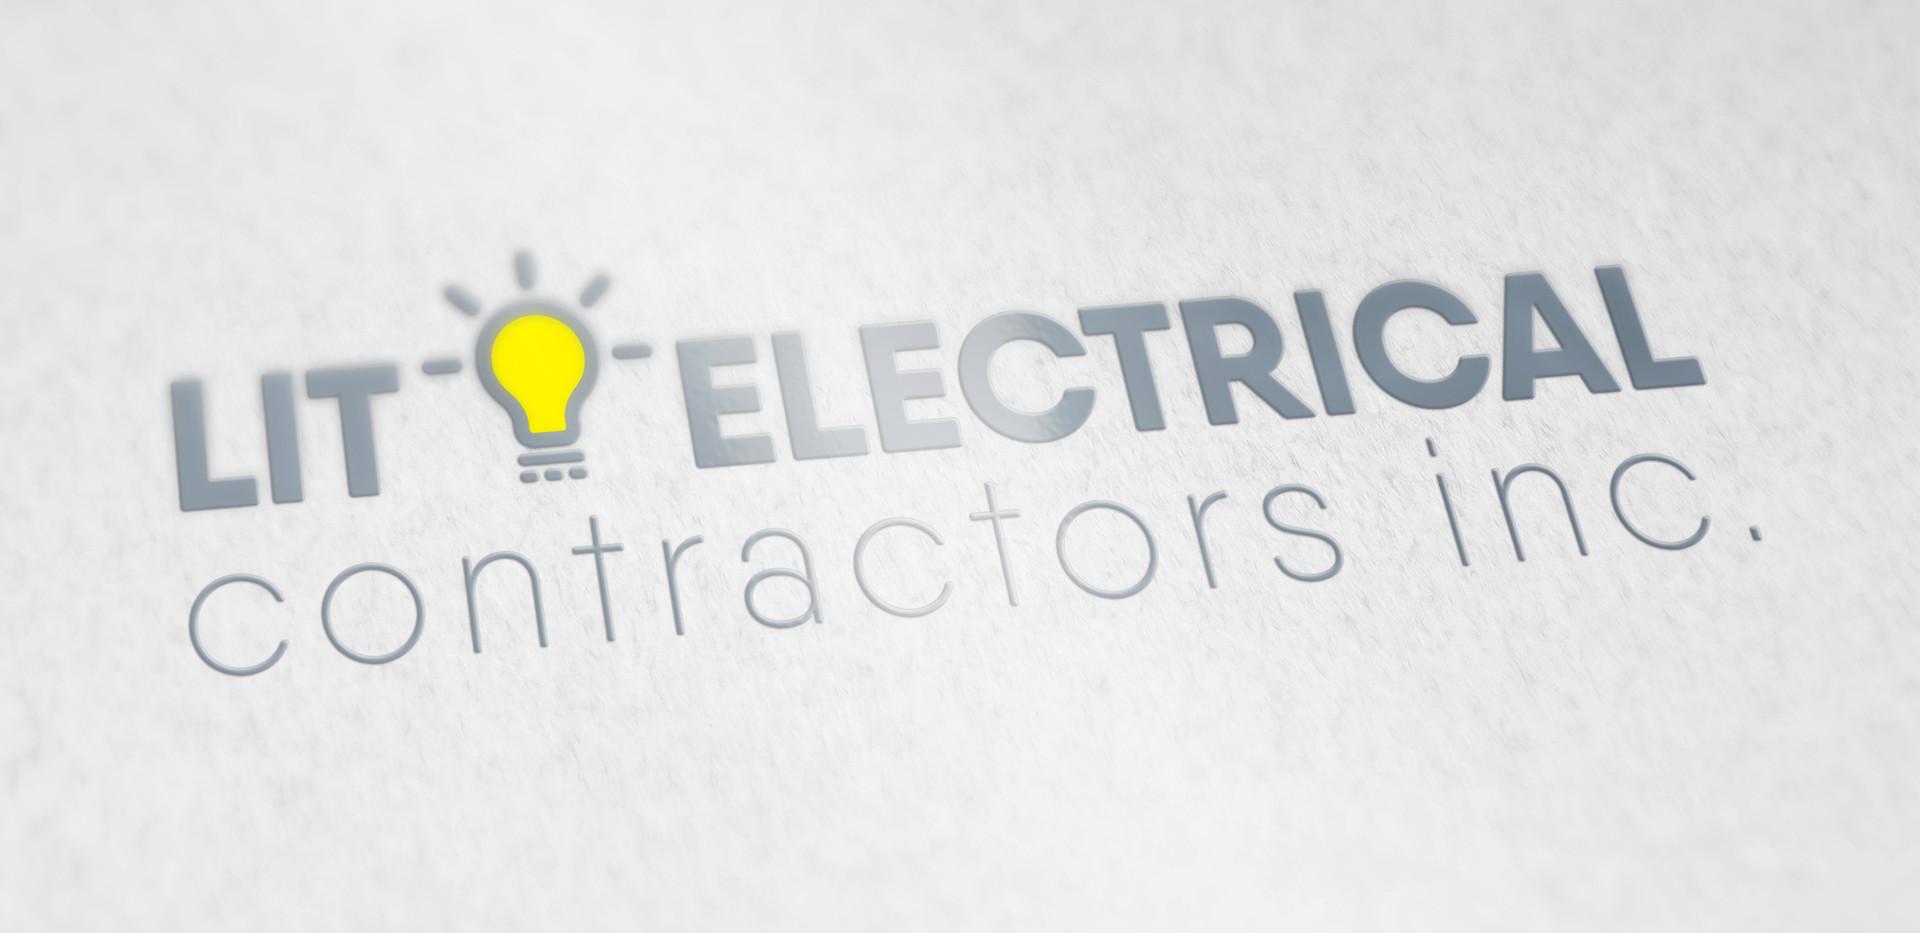 OurWork-Logo-LitElectrical.jpg